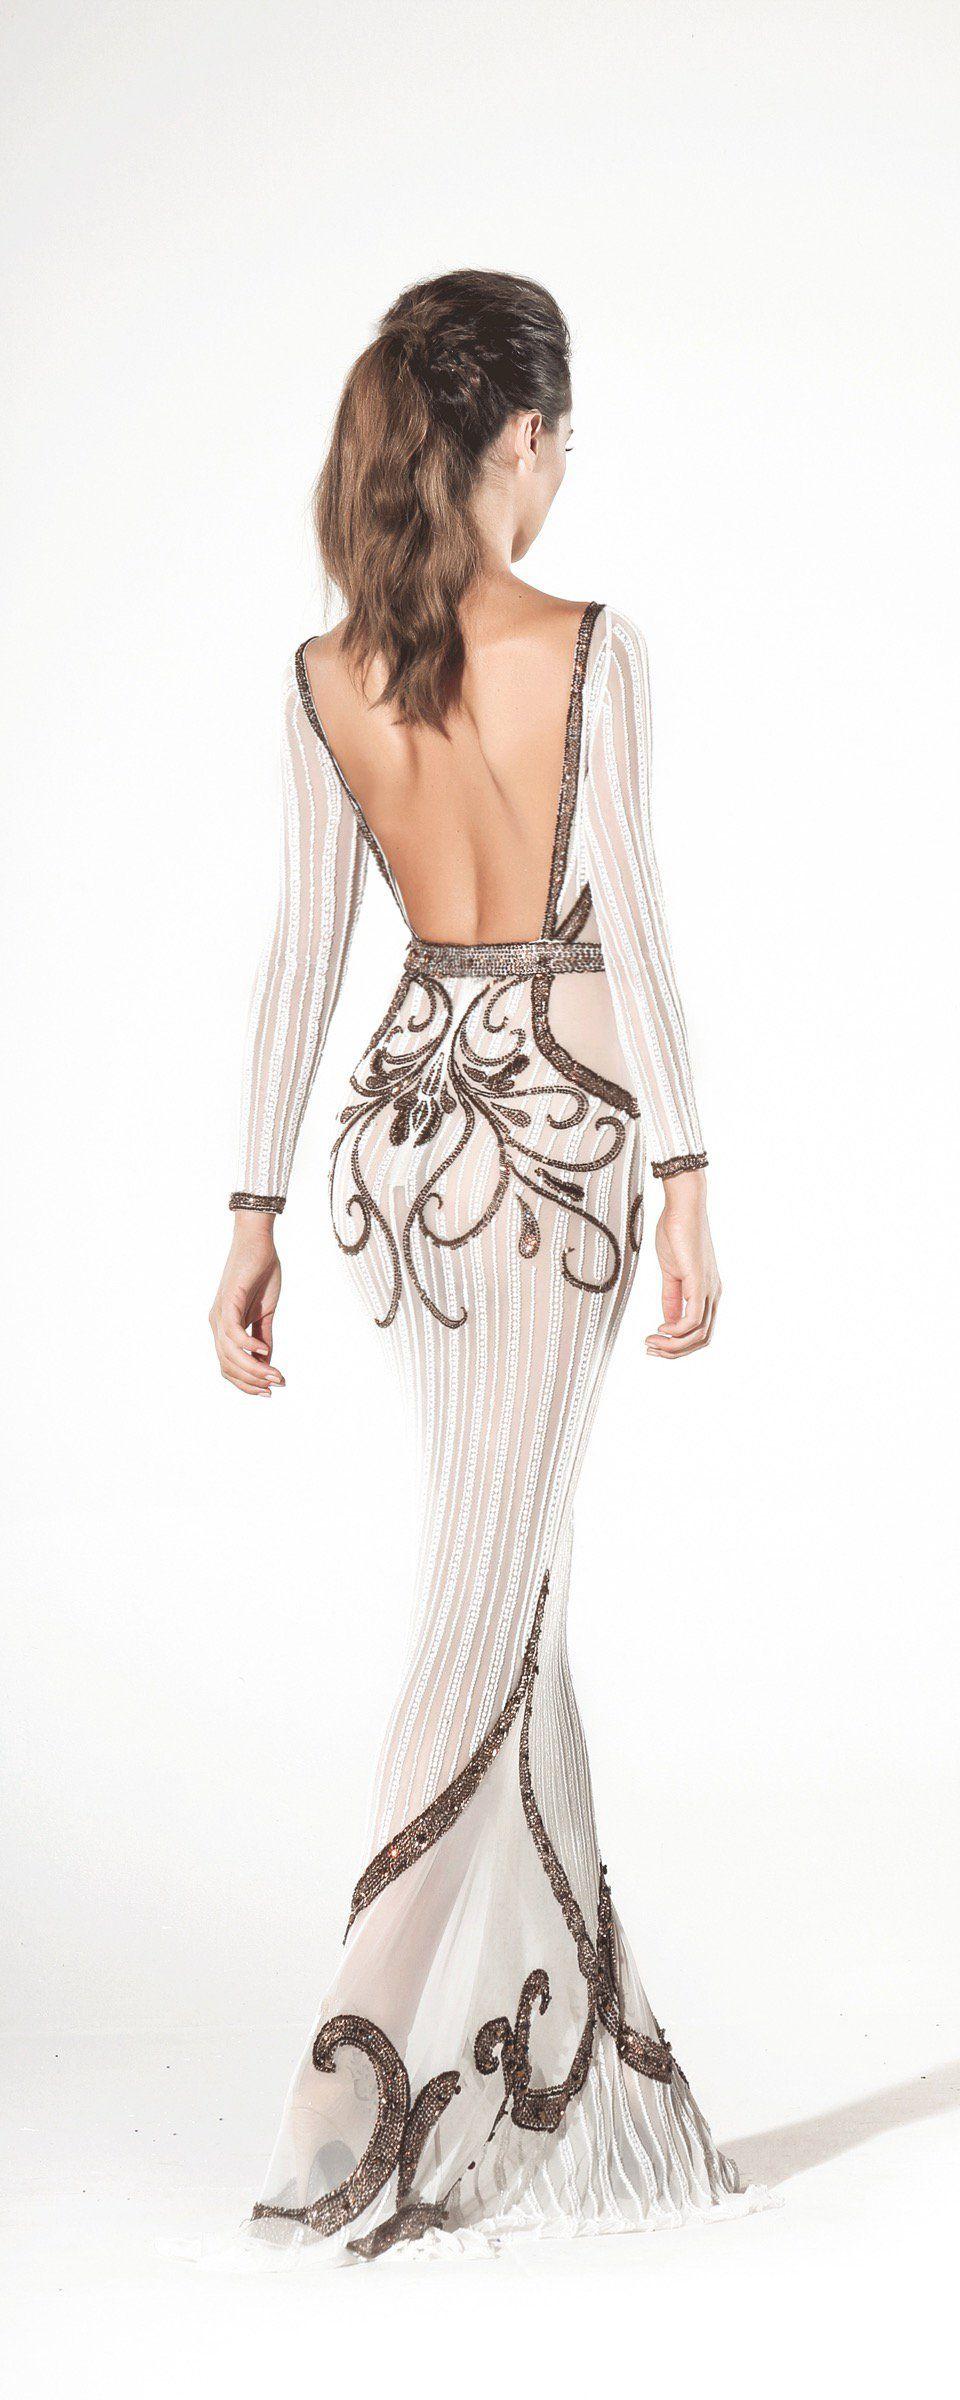 Charbel Zoe Primavera Verao 2016 Alta Costura Http Pt Orientpalms Com Charbel Zoe 6189 Com Imagens Vestidos Legais Vestido Elegante Belos Vestidos